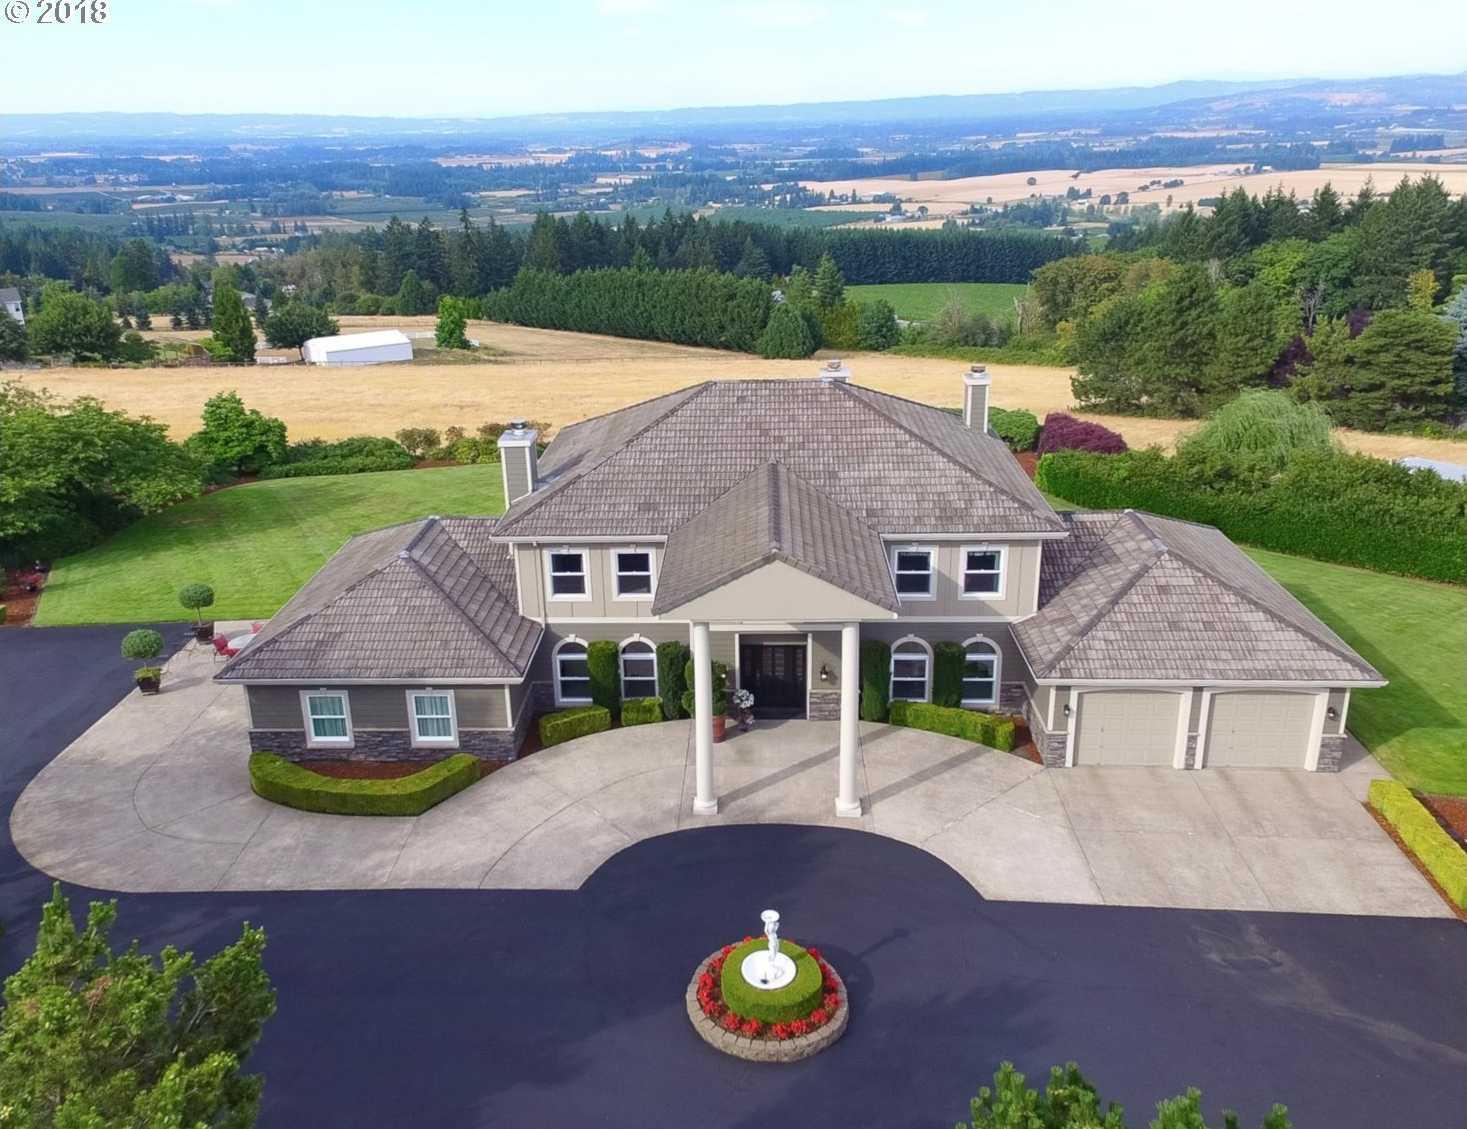 $1,100,000 - 4Br/4Ba -  for Sale in Bald Peak, Hillsboro